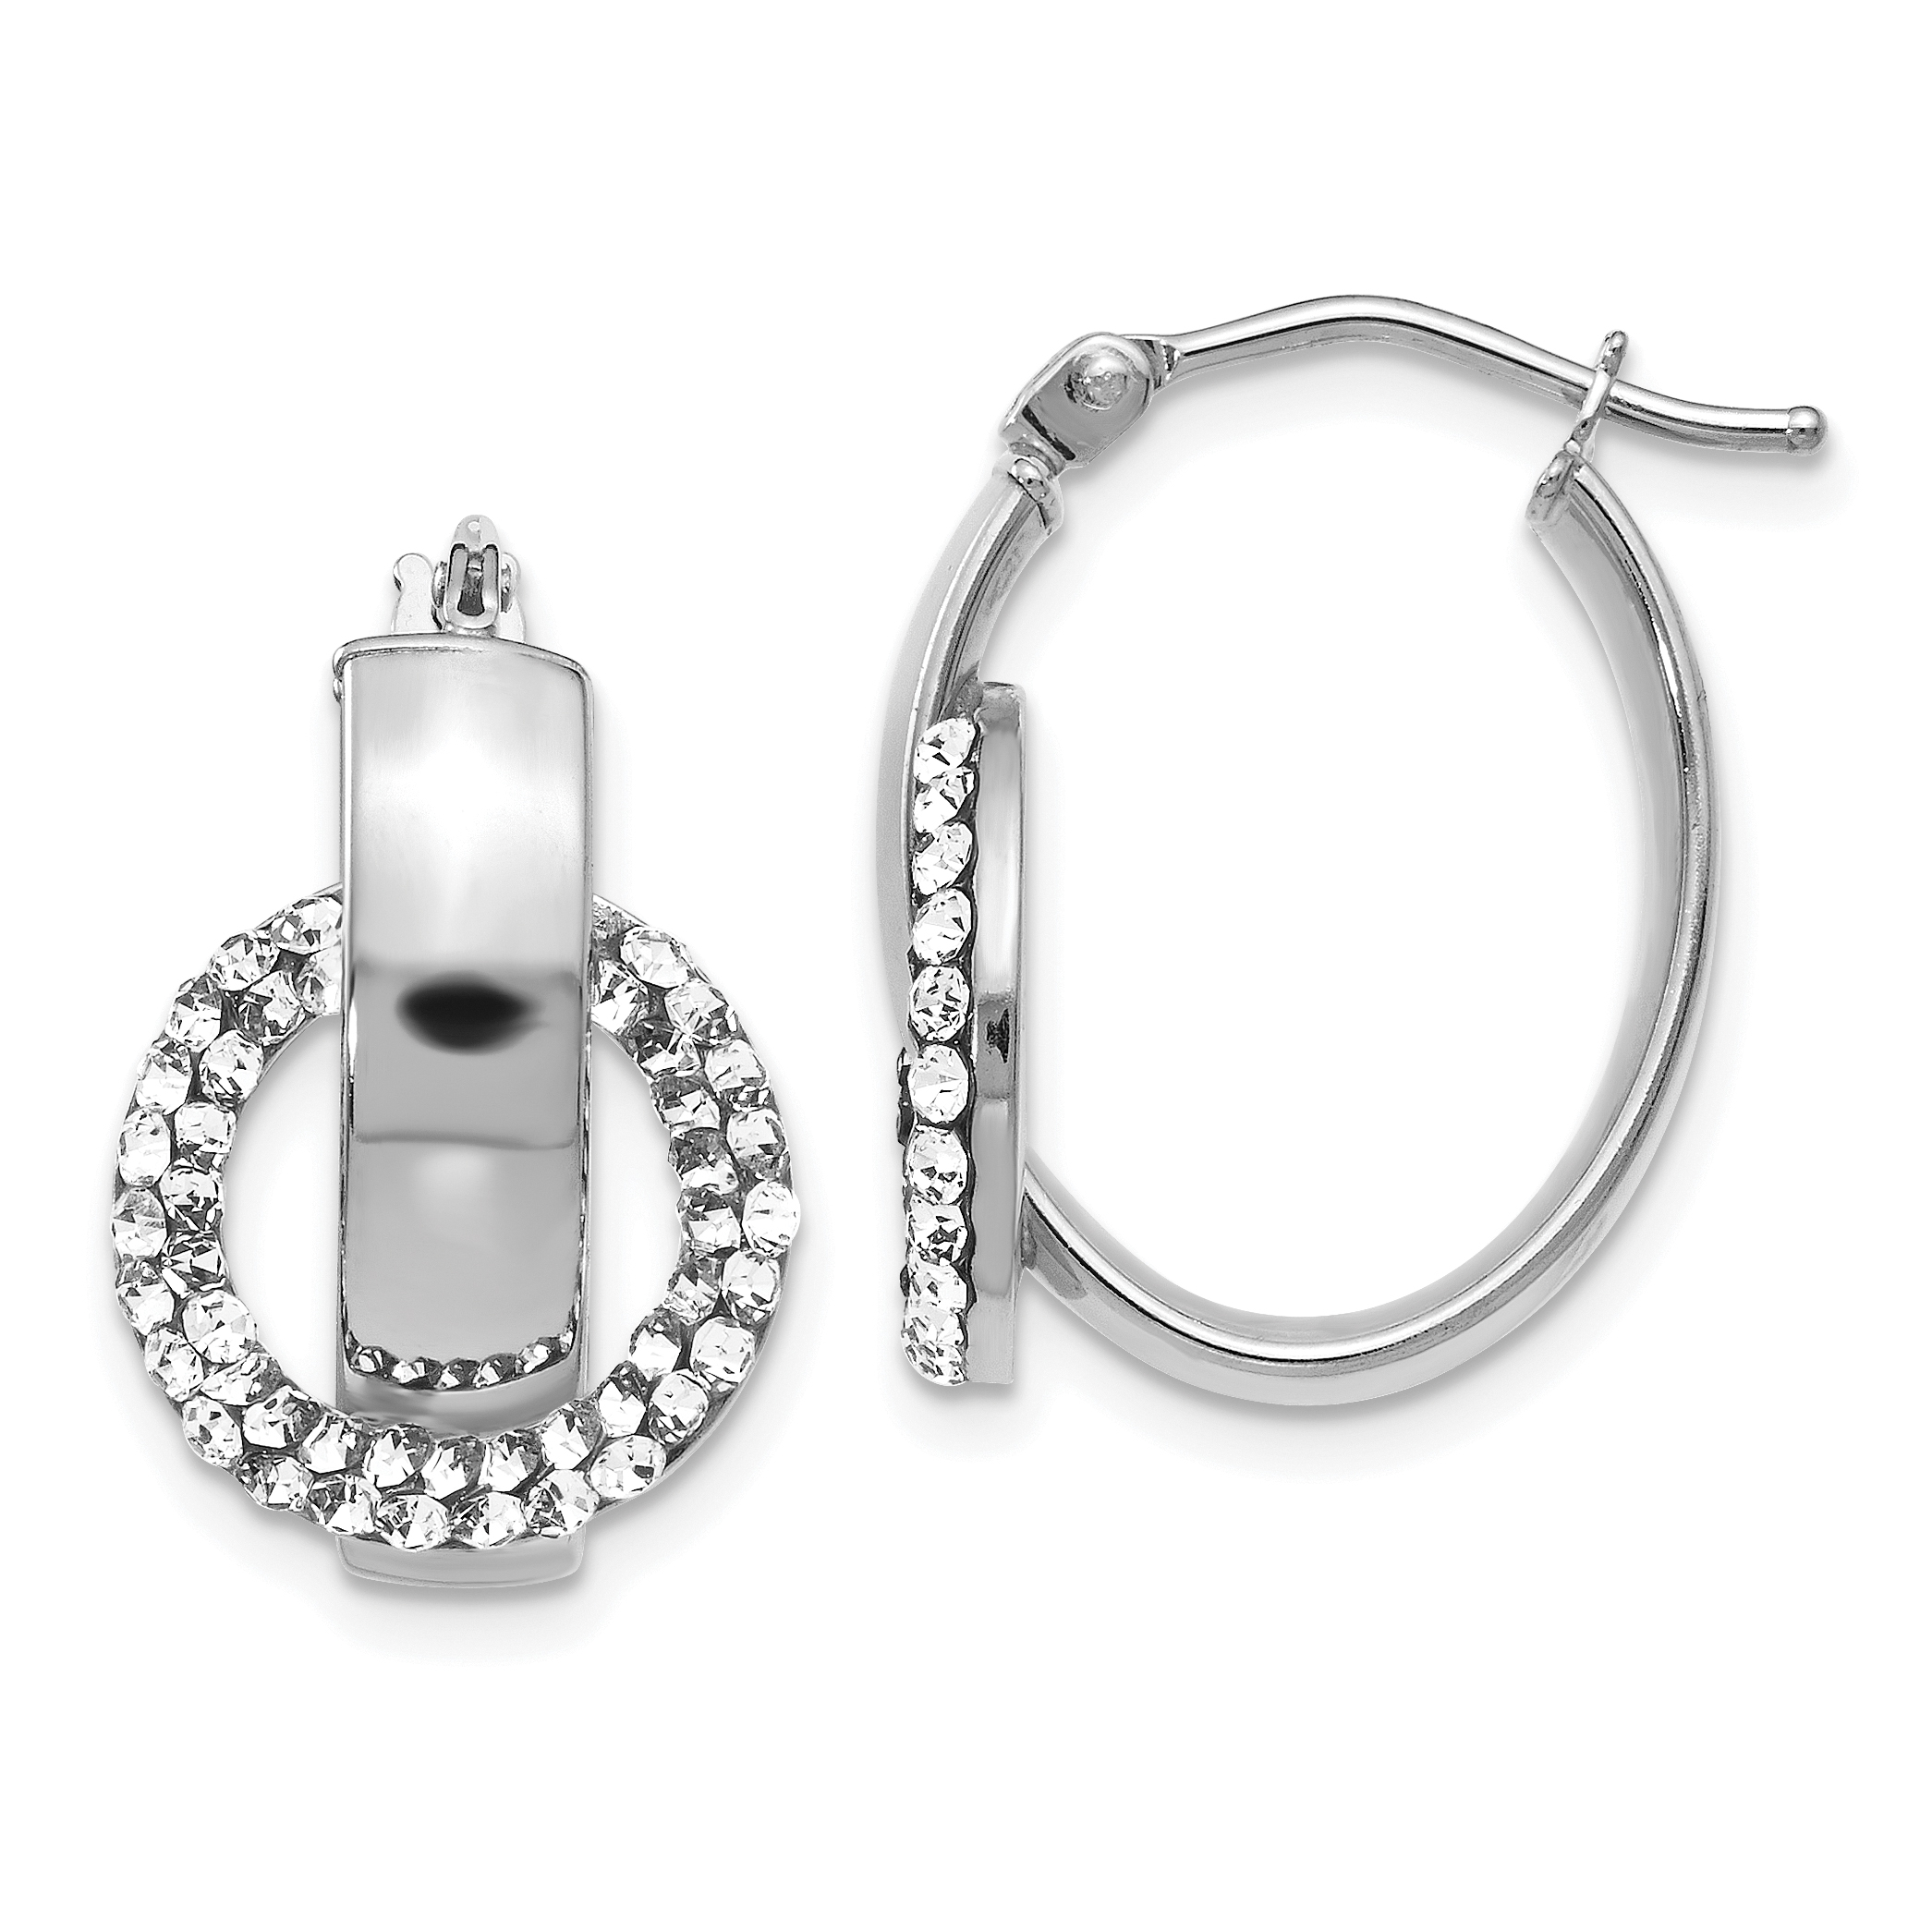 50b7b6473c5028 Leslie s 14k White Gold Crystals from Swarovski Oval Hinged Hoop Earrings